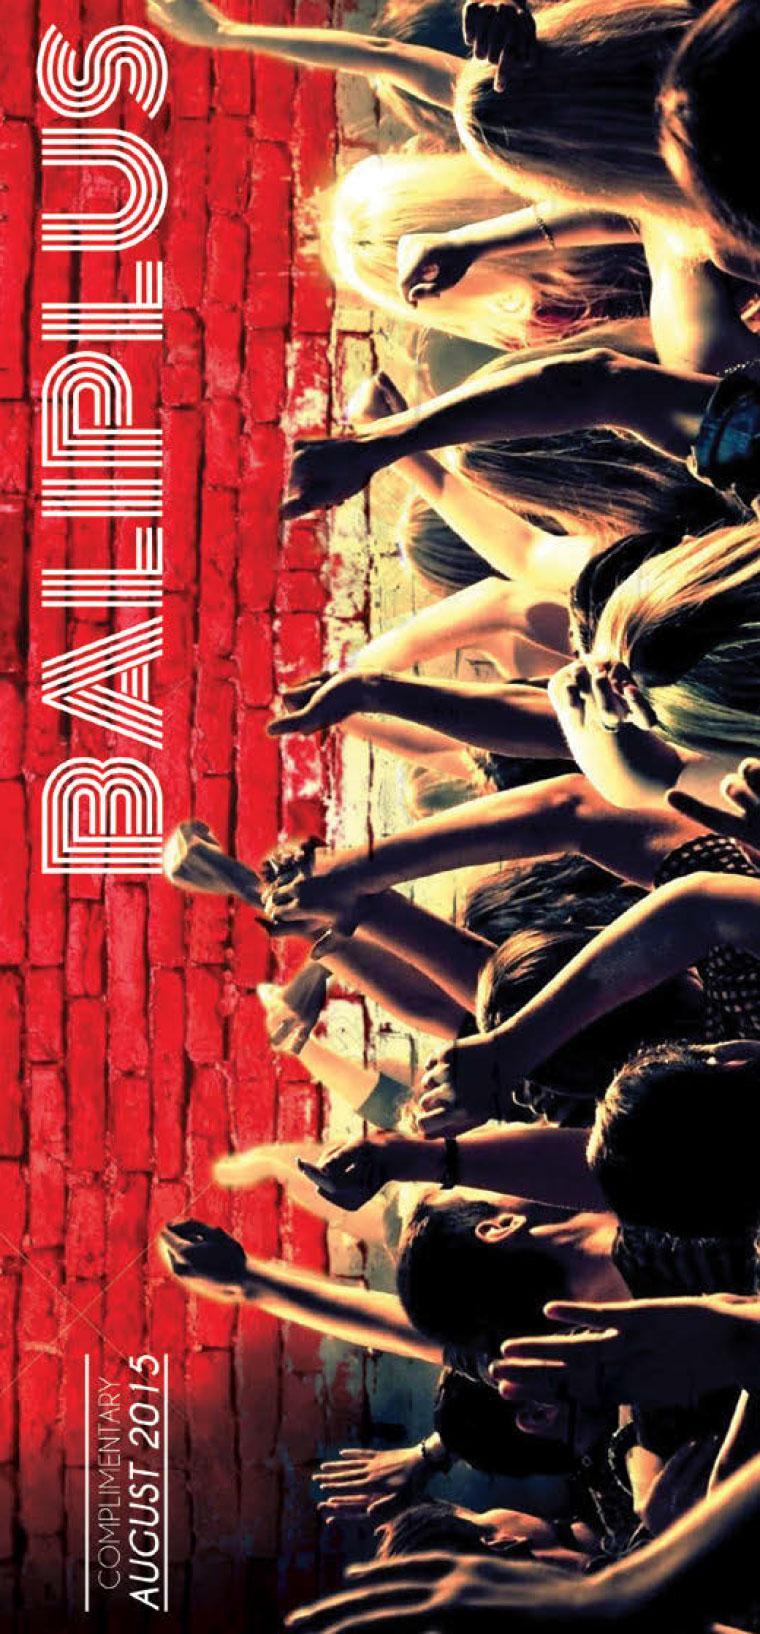 BALI PLUS Digital Magazine August 2015